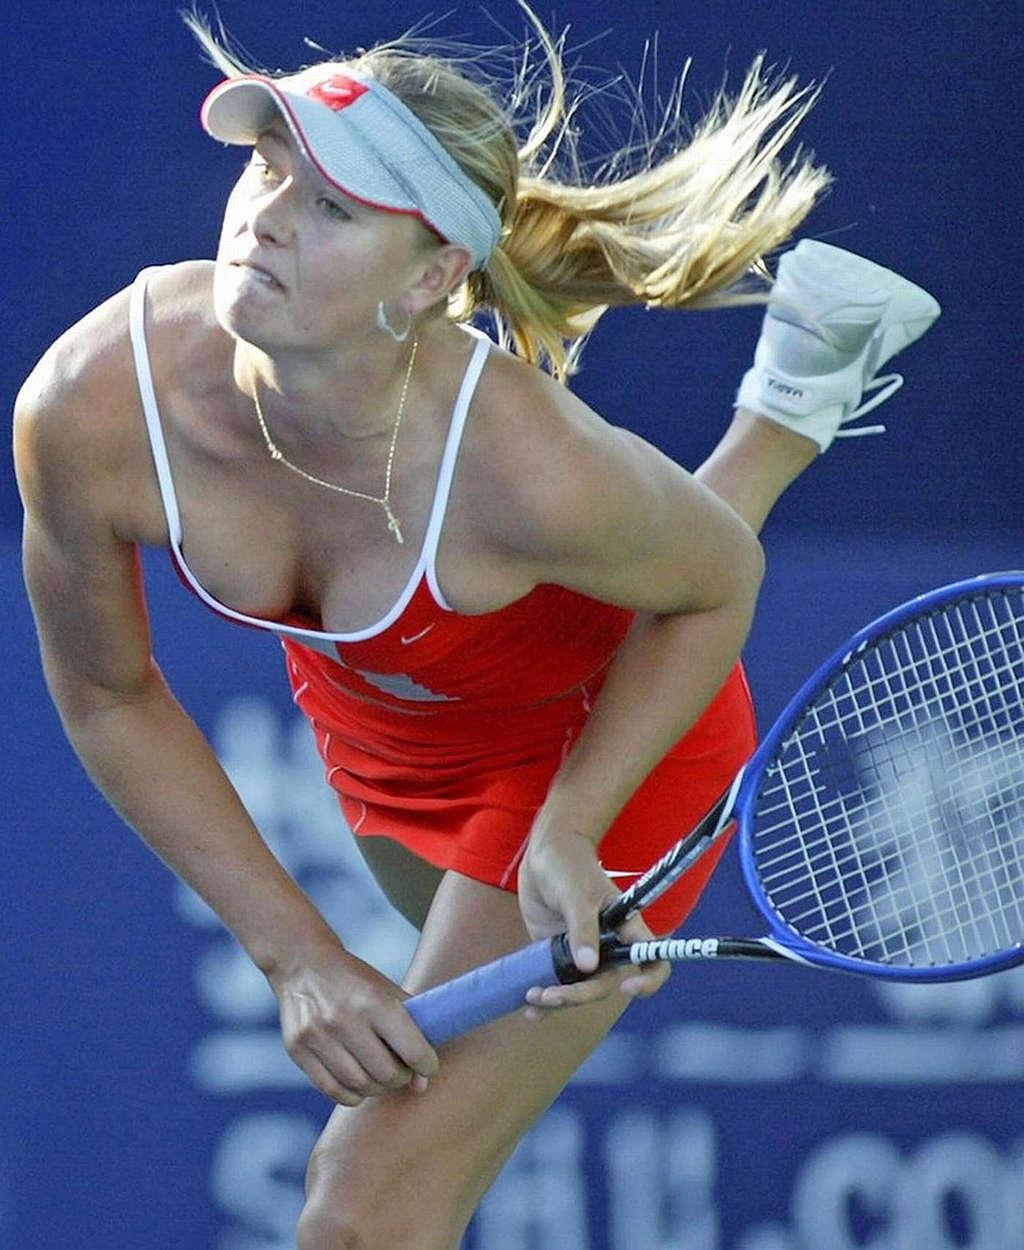 Top tennis players